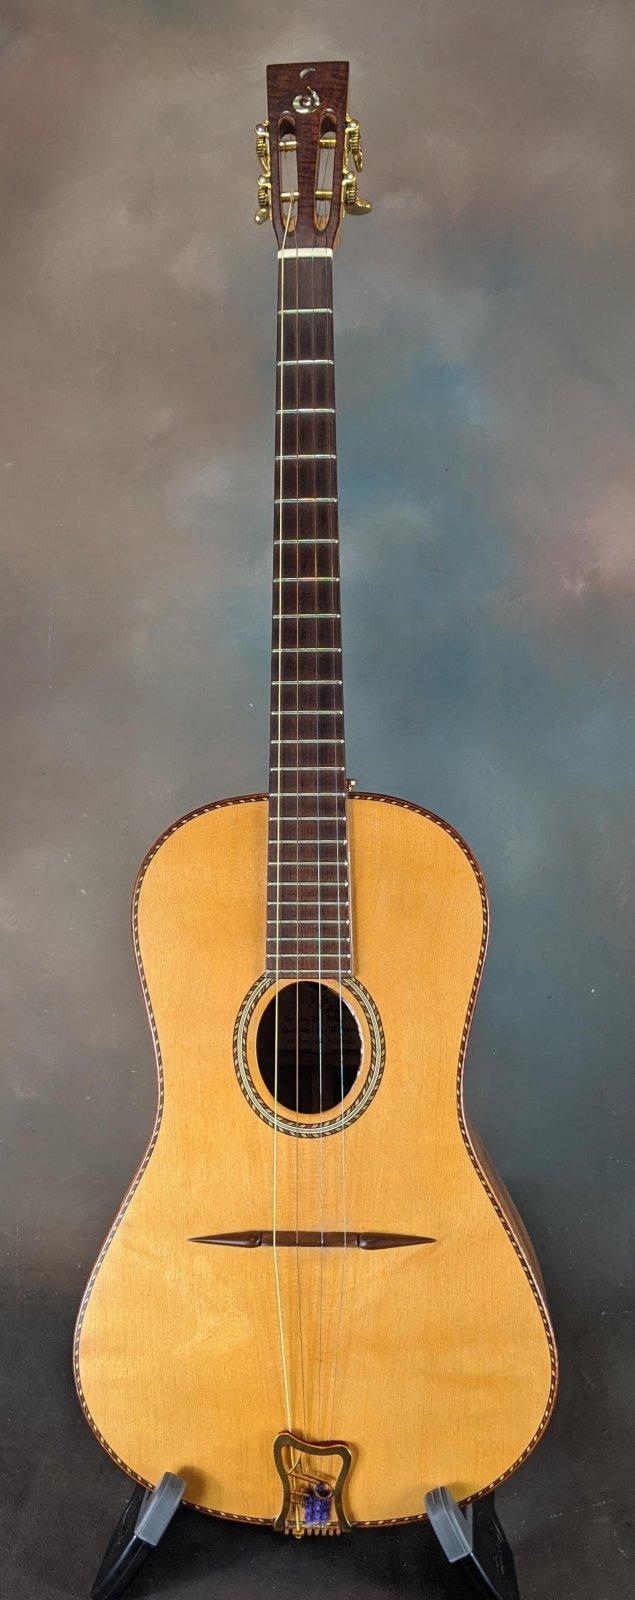 2005 Jack Spira Ditson-Style Tenor Guitar - Made in Australia!